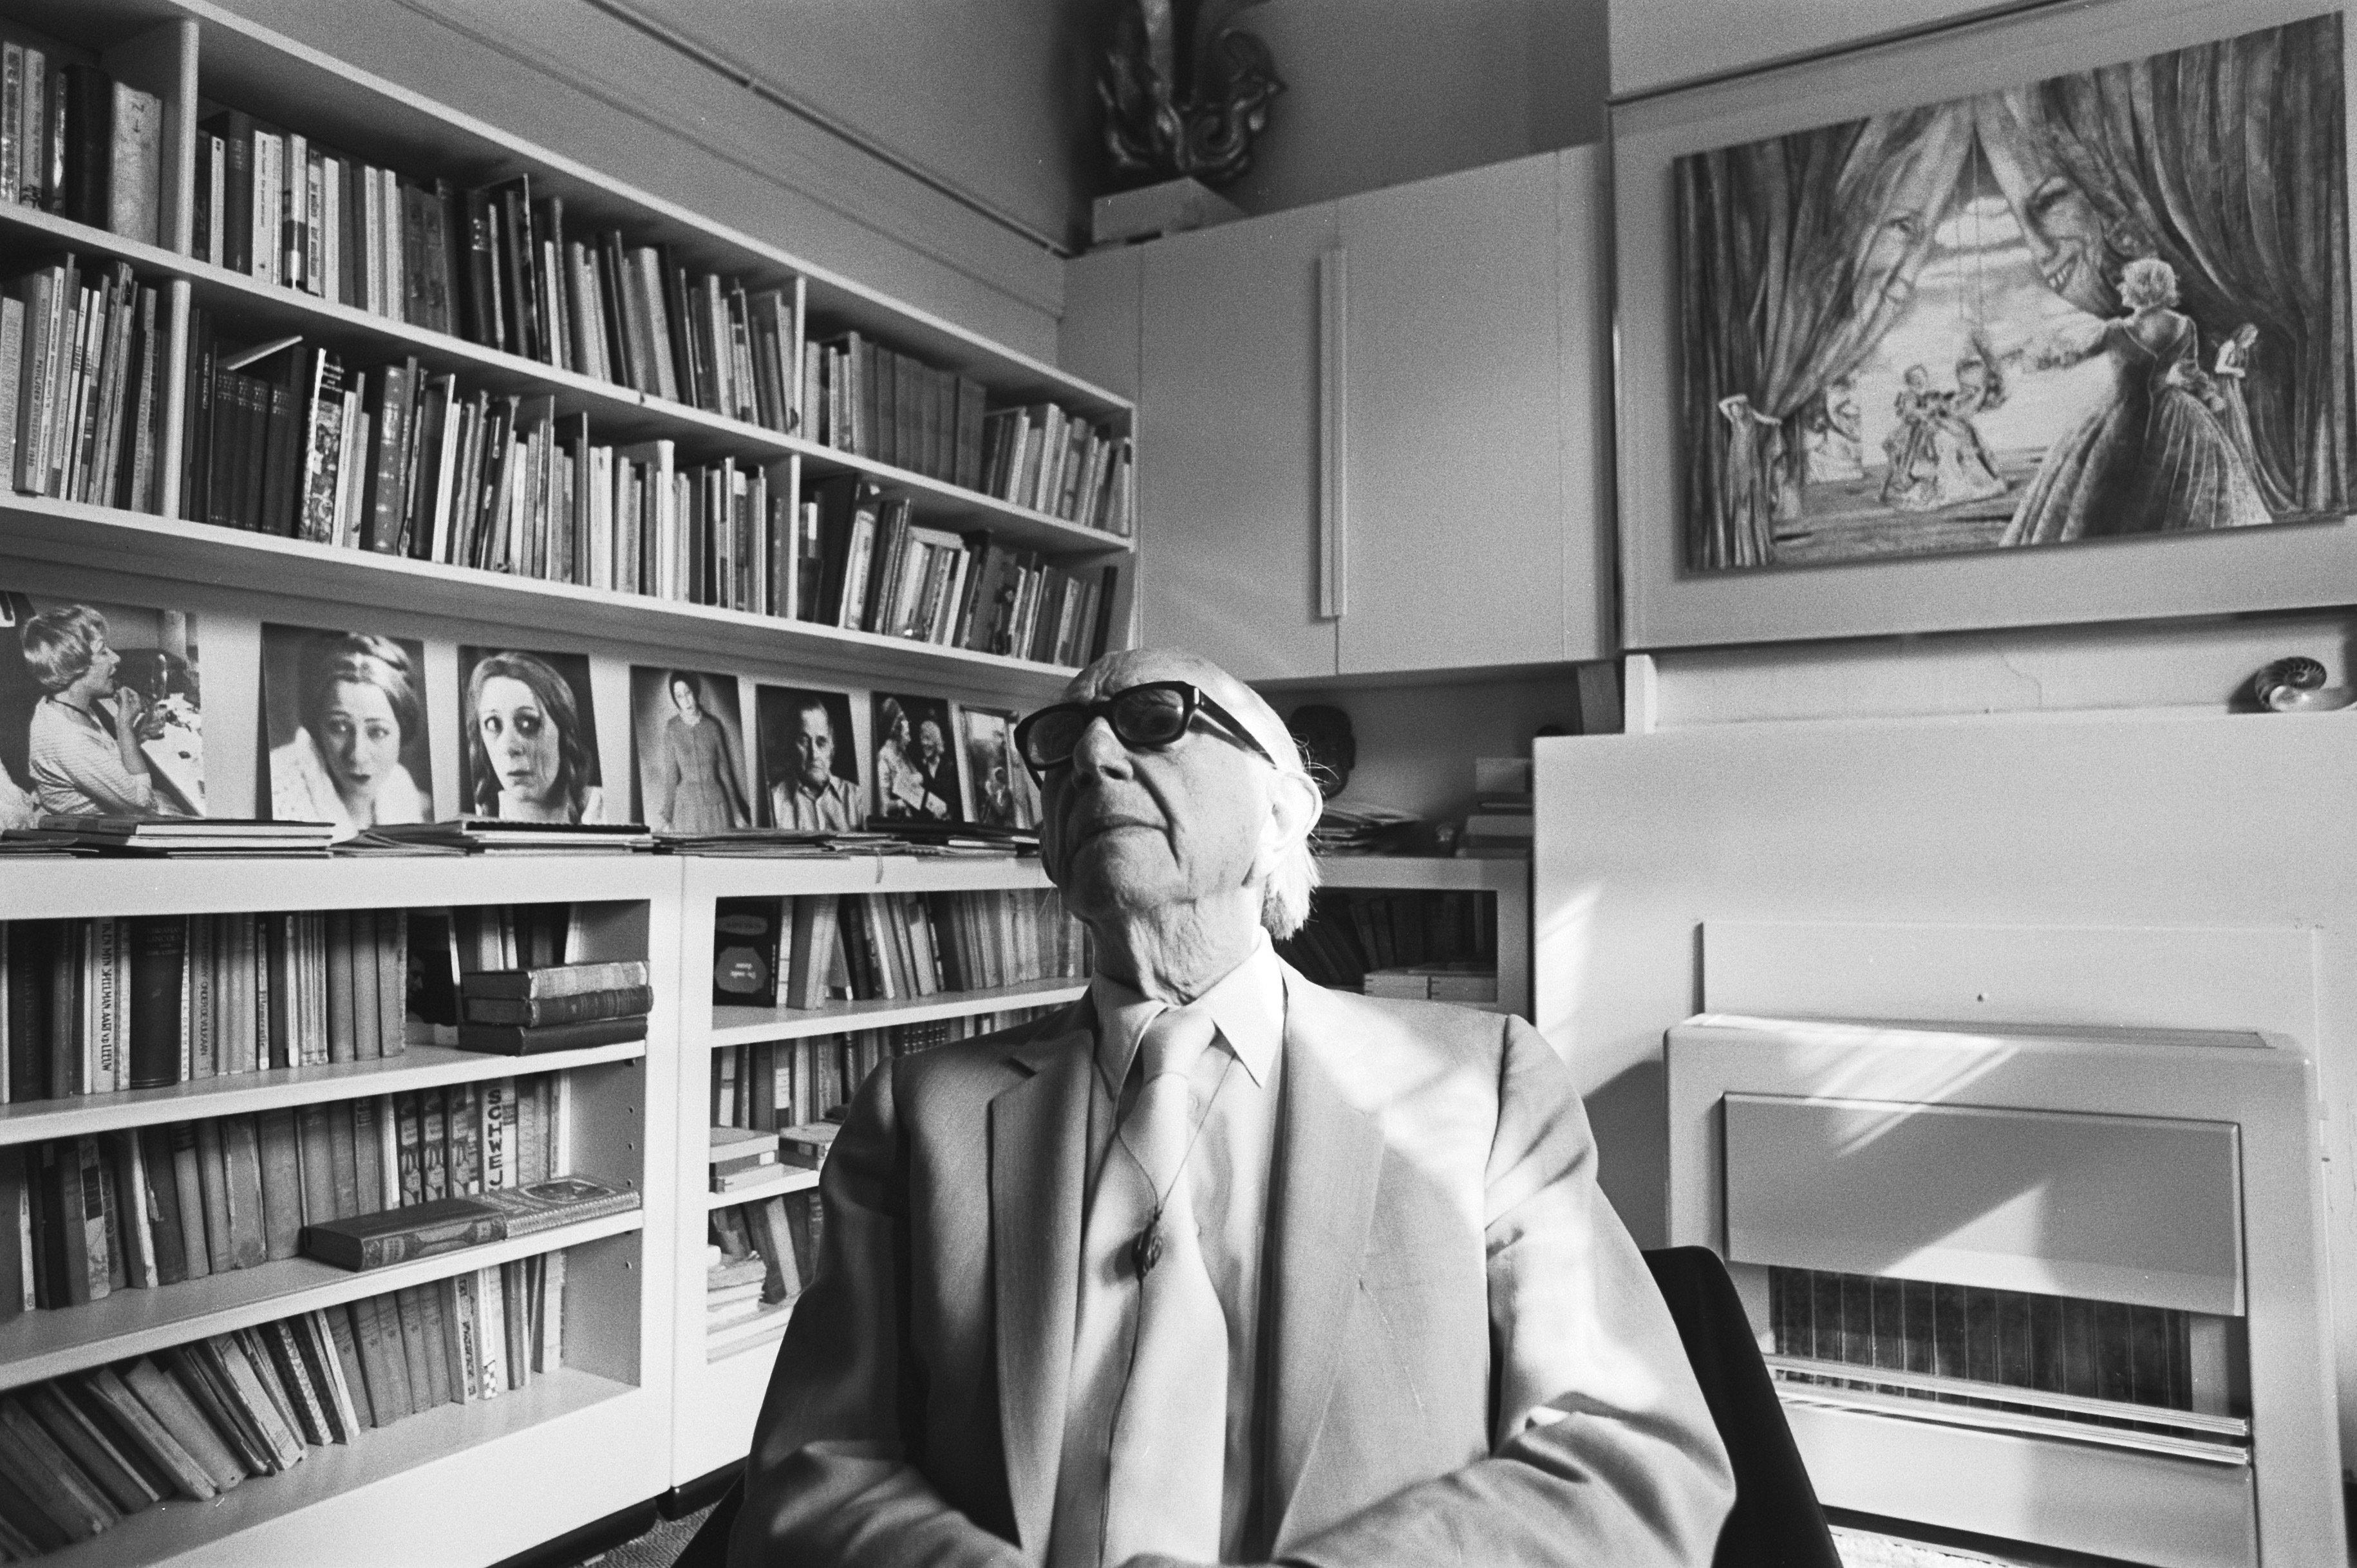 Filemorgen Viert De Bekende Nederlandse Architekt Dichter